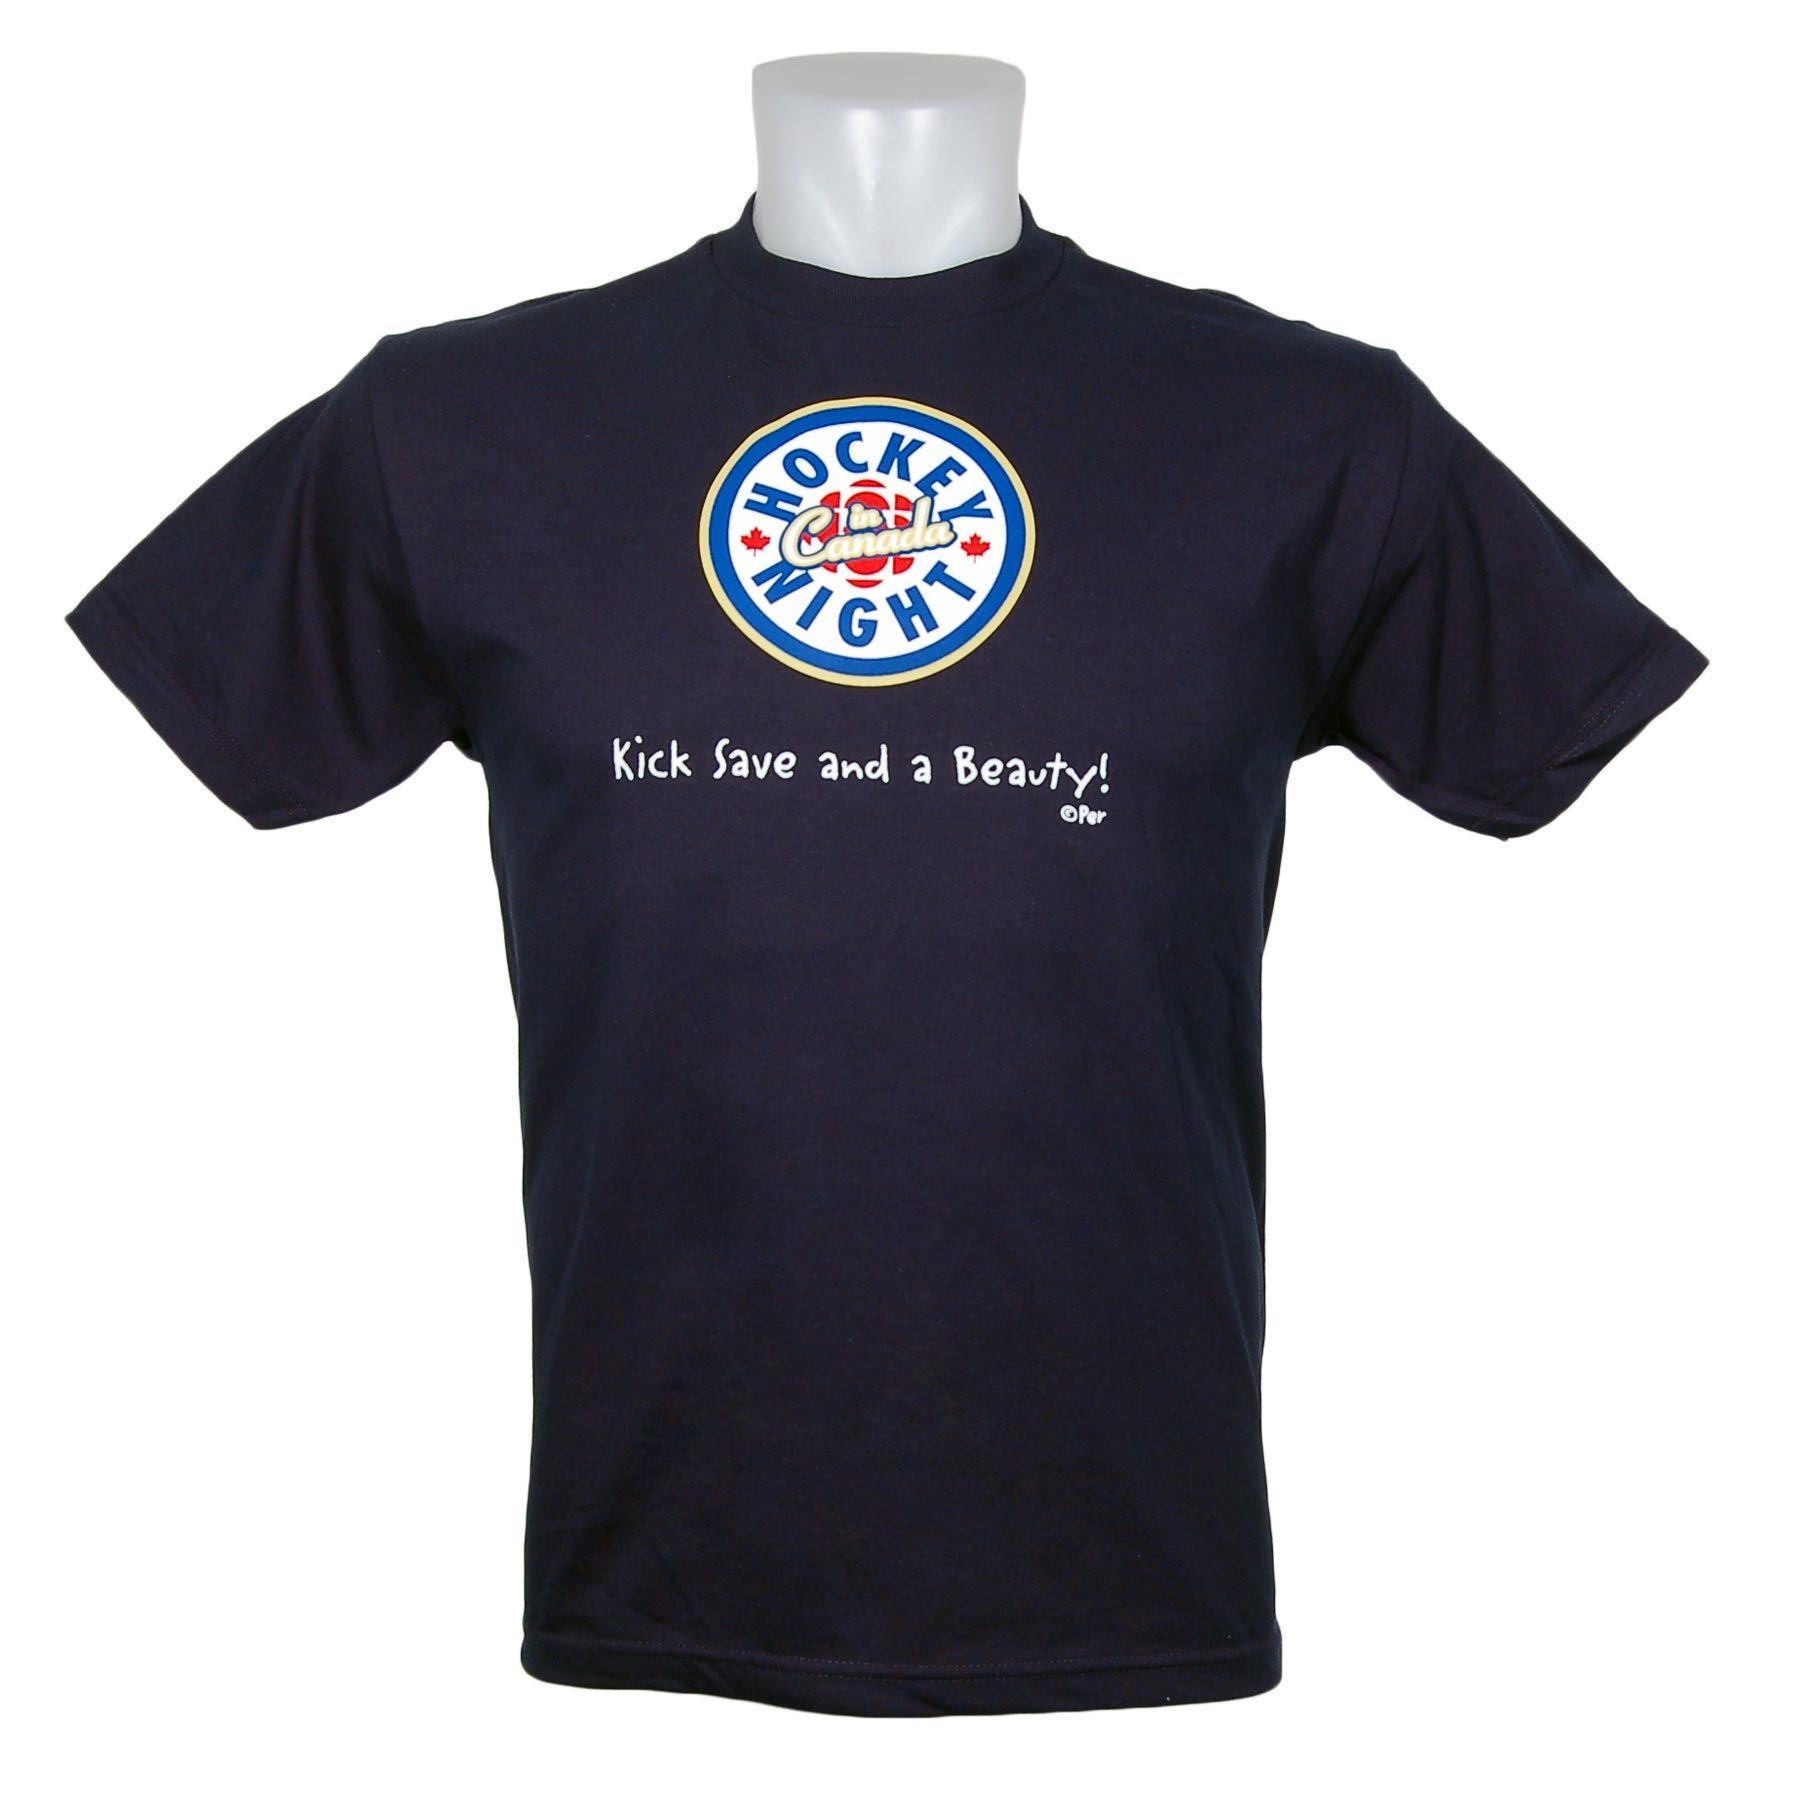 Hockey Night In Canada Kick Save And A Beauty T Shirt Navy The Classic Hnic Logo Available At Icejerseys Com Of Hockey Clothes Mens Tshirts Mens Tops